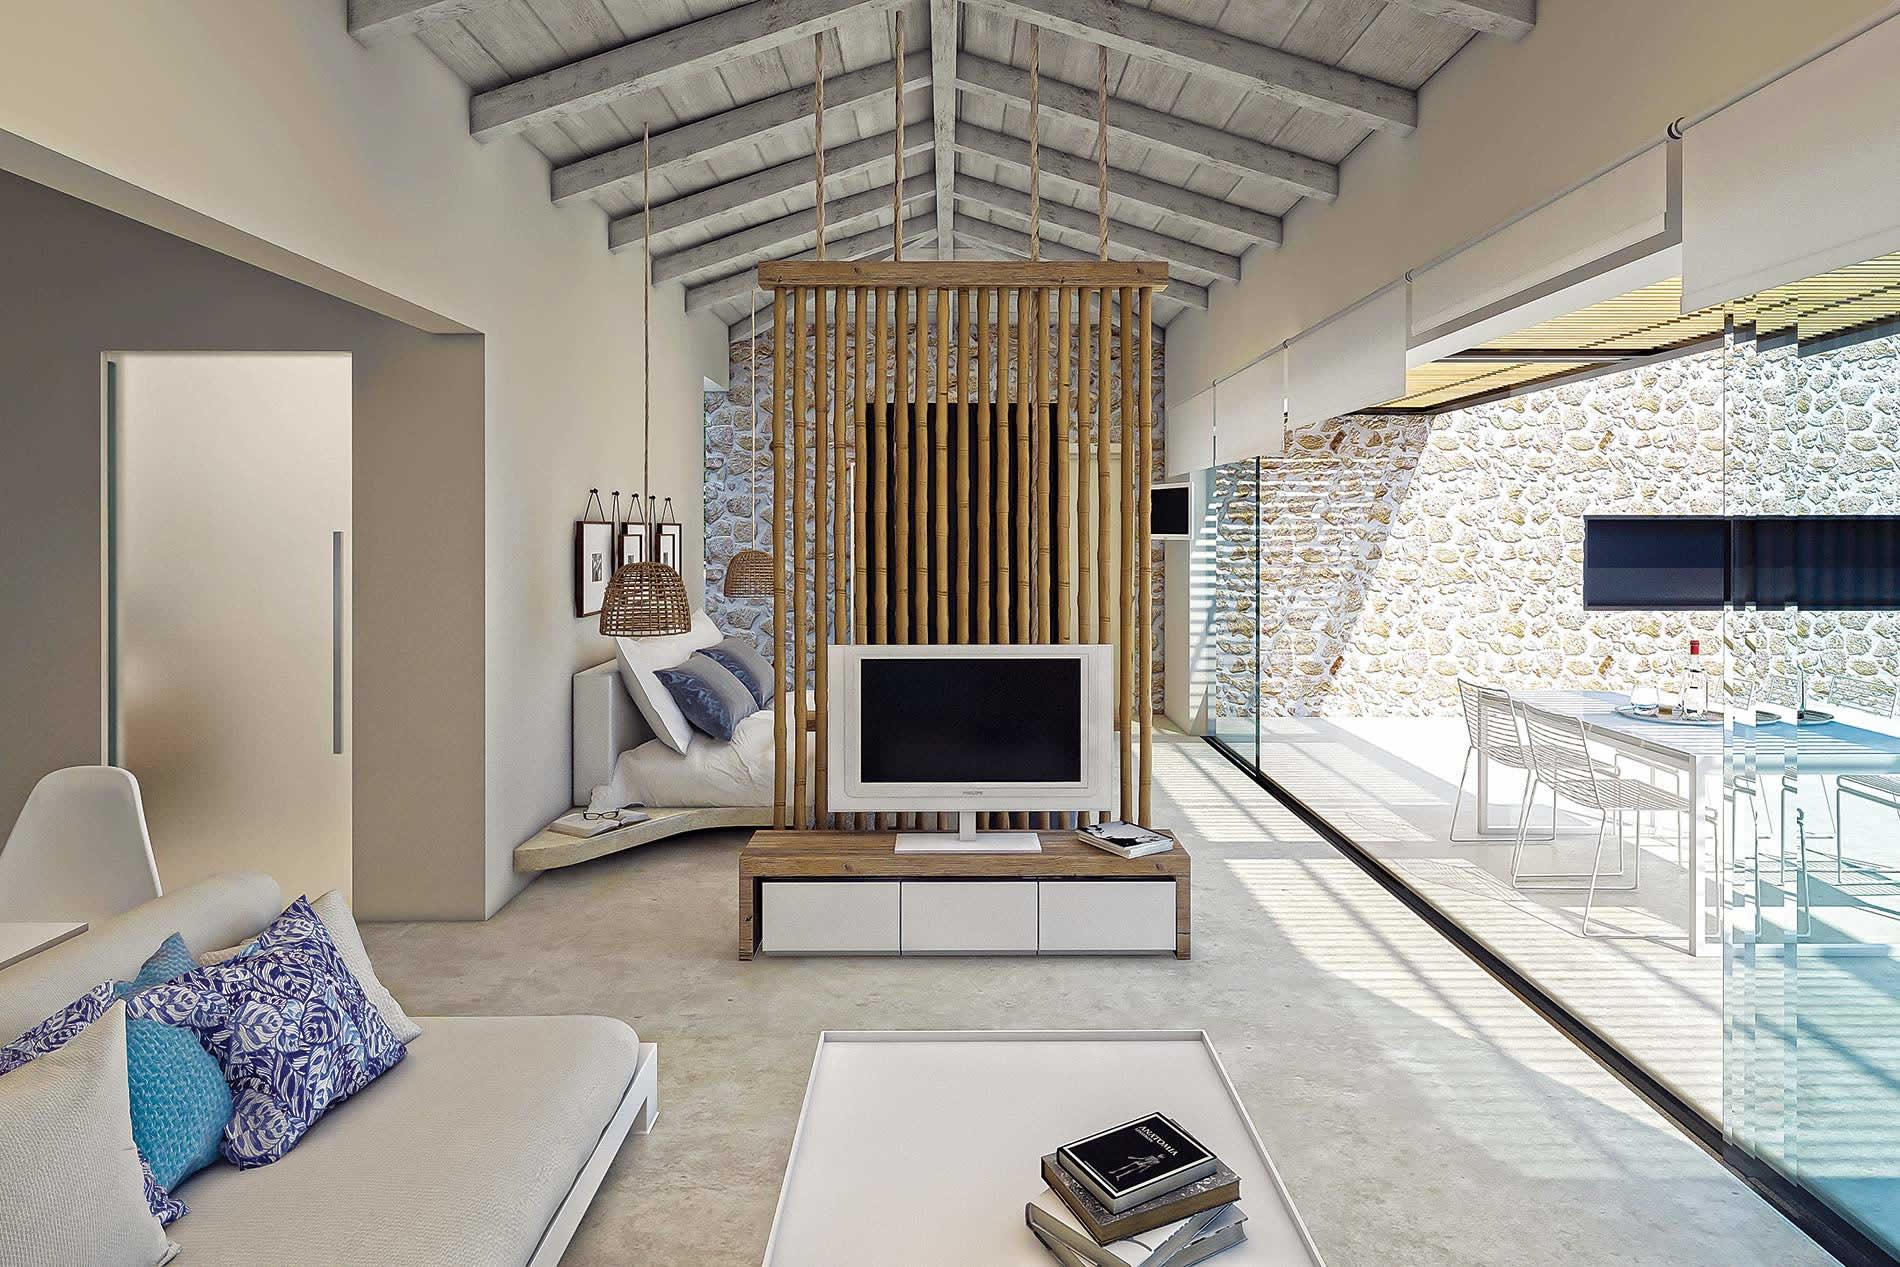 Villa Emerald Suites in Agios Nikolaos - sleeps 2 people